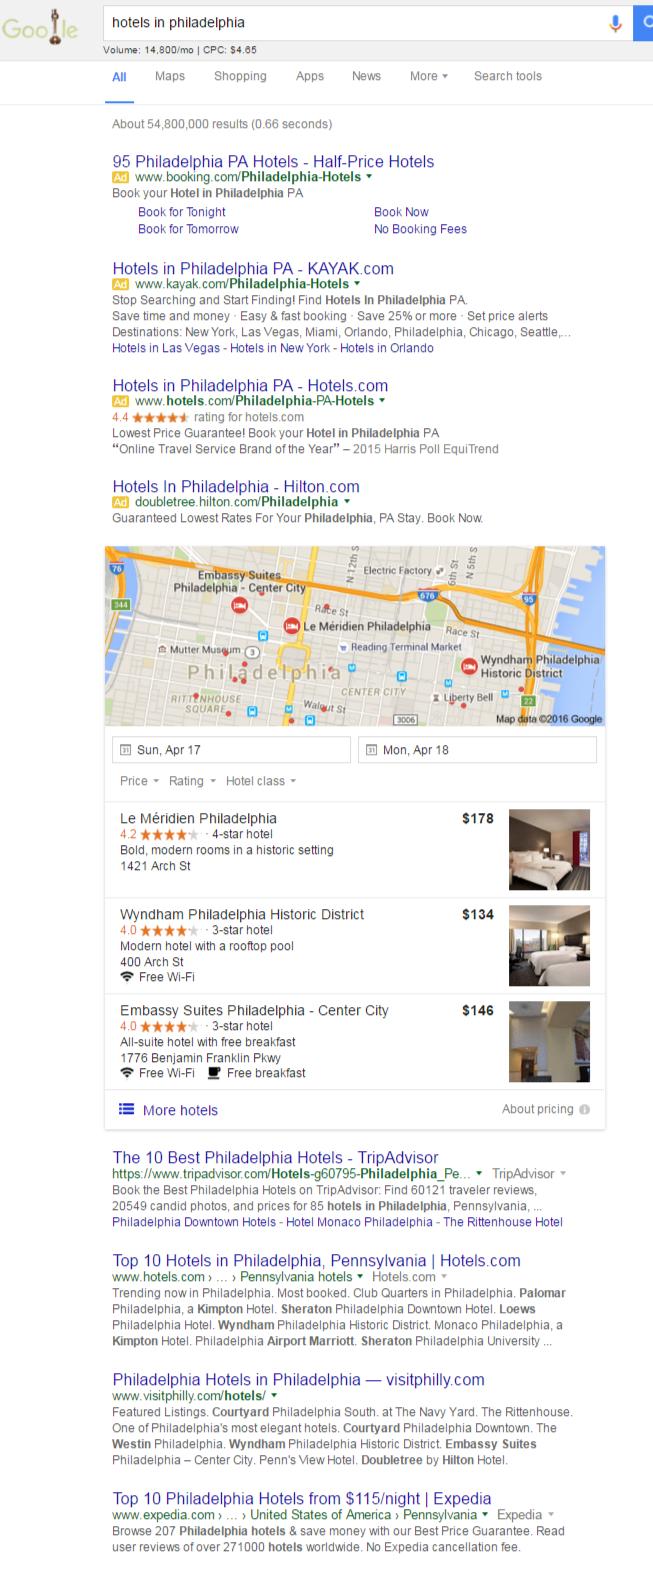 FireShot Capture 2 - hotels in philadelphia - Google Search_ - https___www.google.com_search